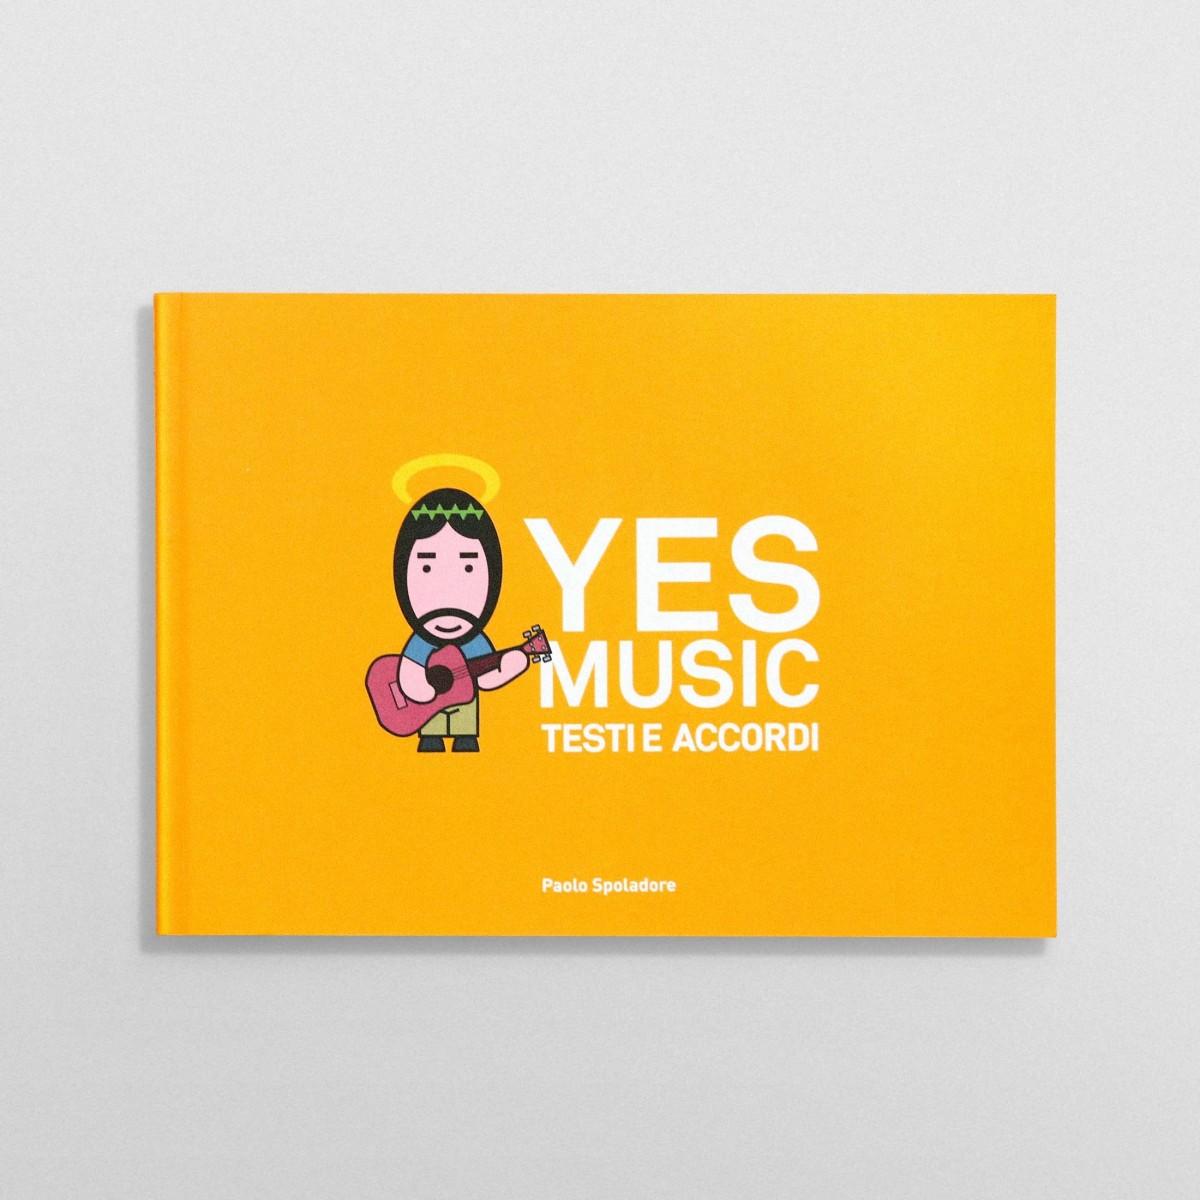 Yes Music Testi e Accordi